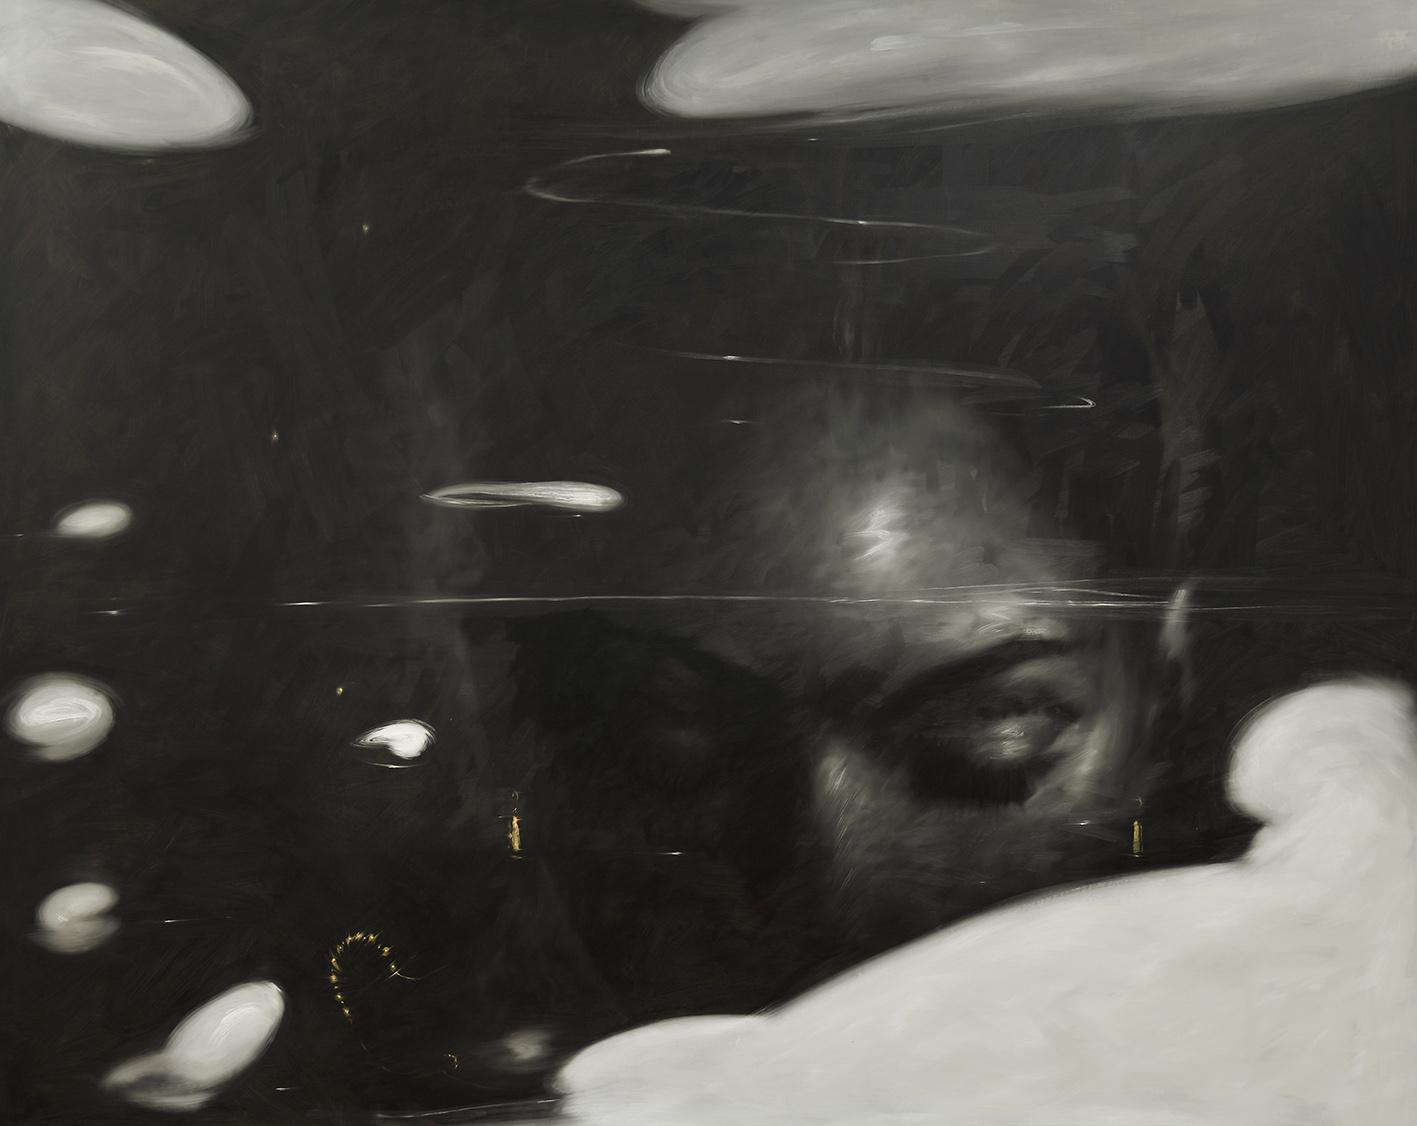 Omar Galliani, Felden lake, 2016, olio su tela, cm 200x330